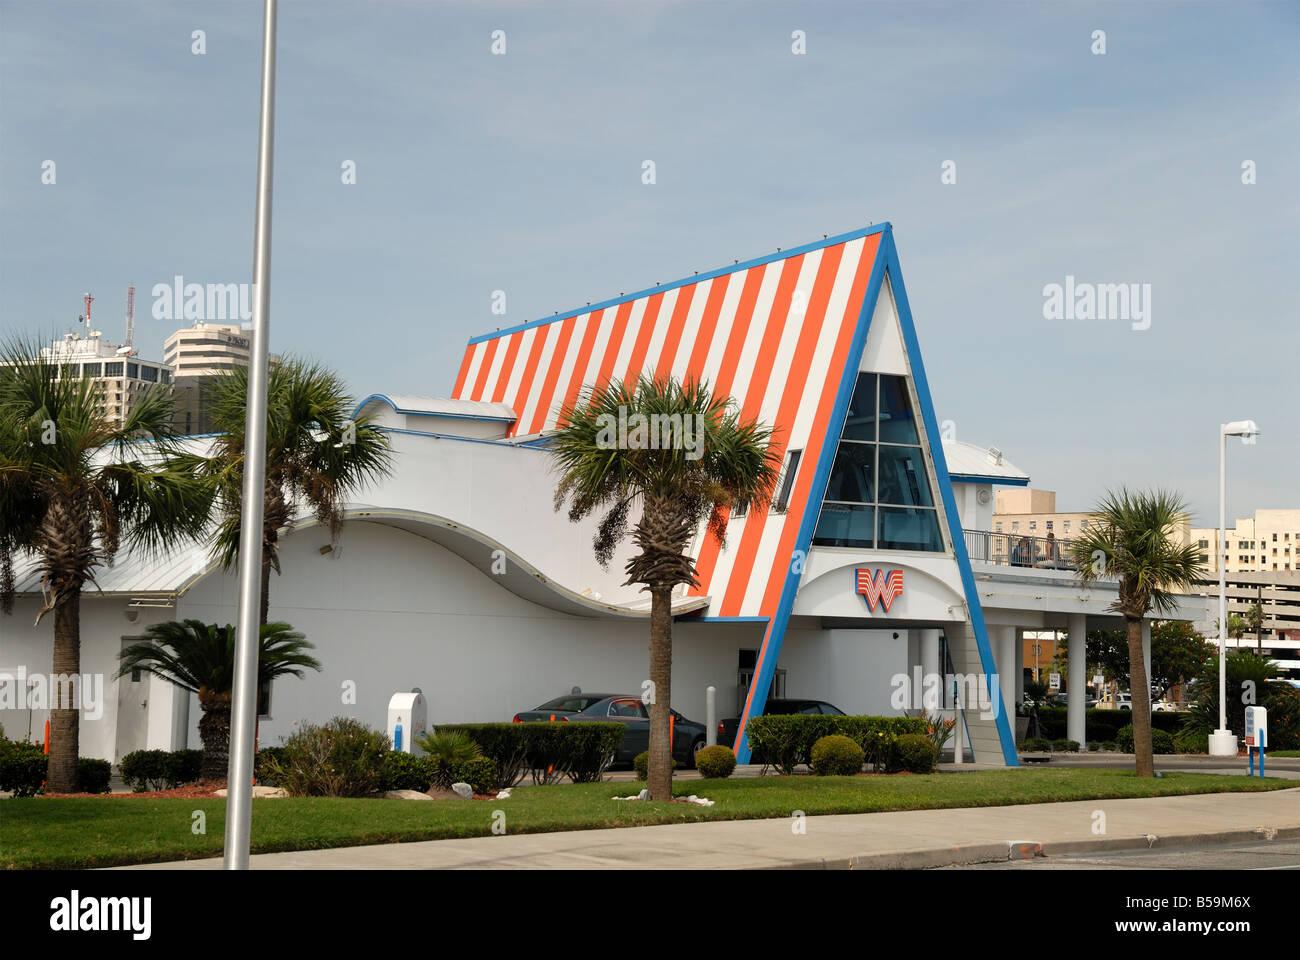 Texas Tx Restaurant Stock Photos & Texas Tx Restaurant Stock Images